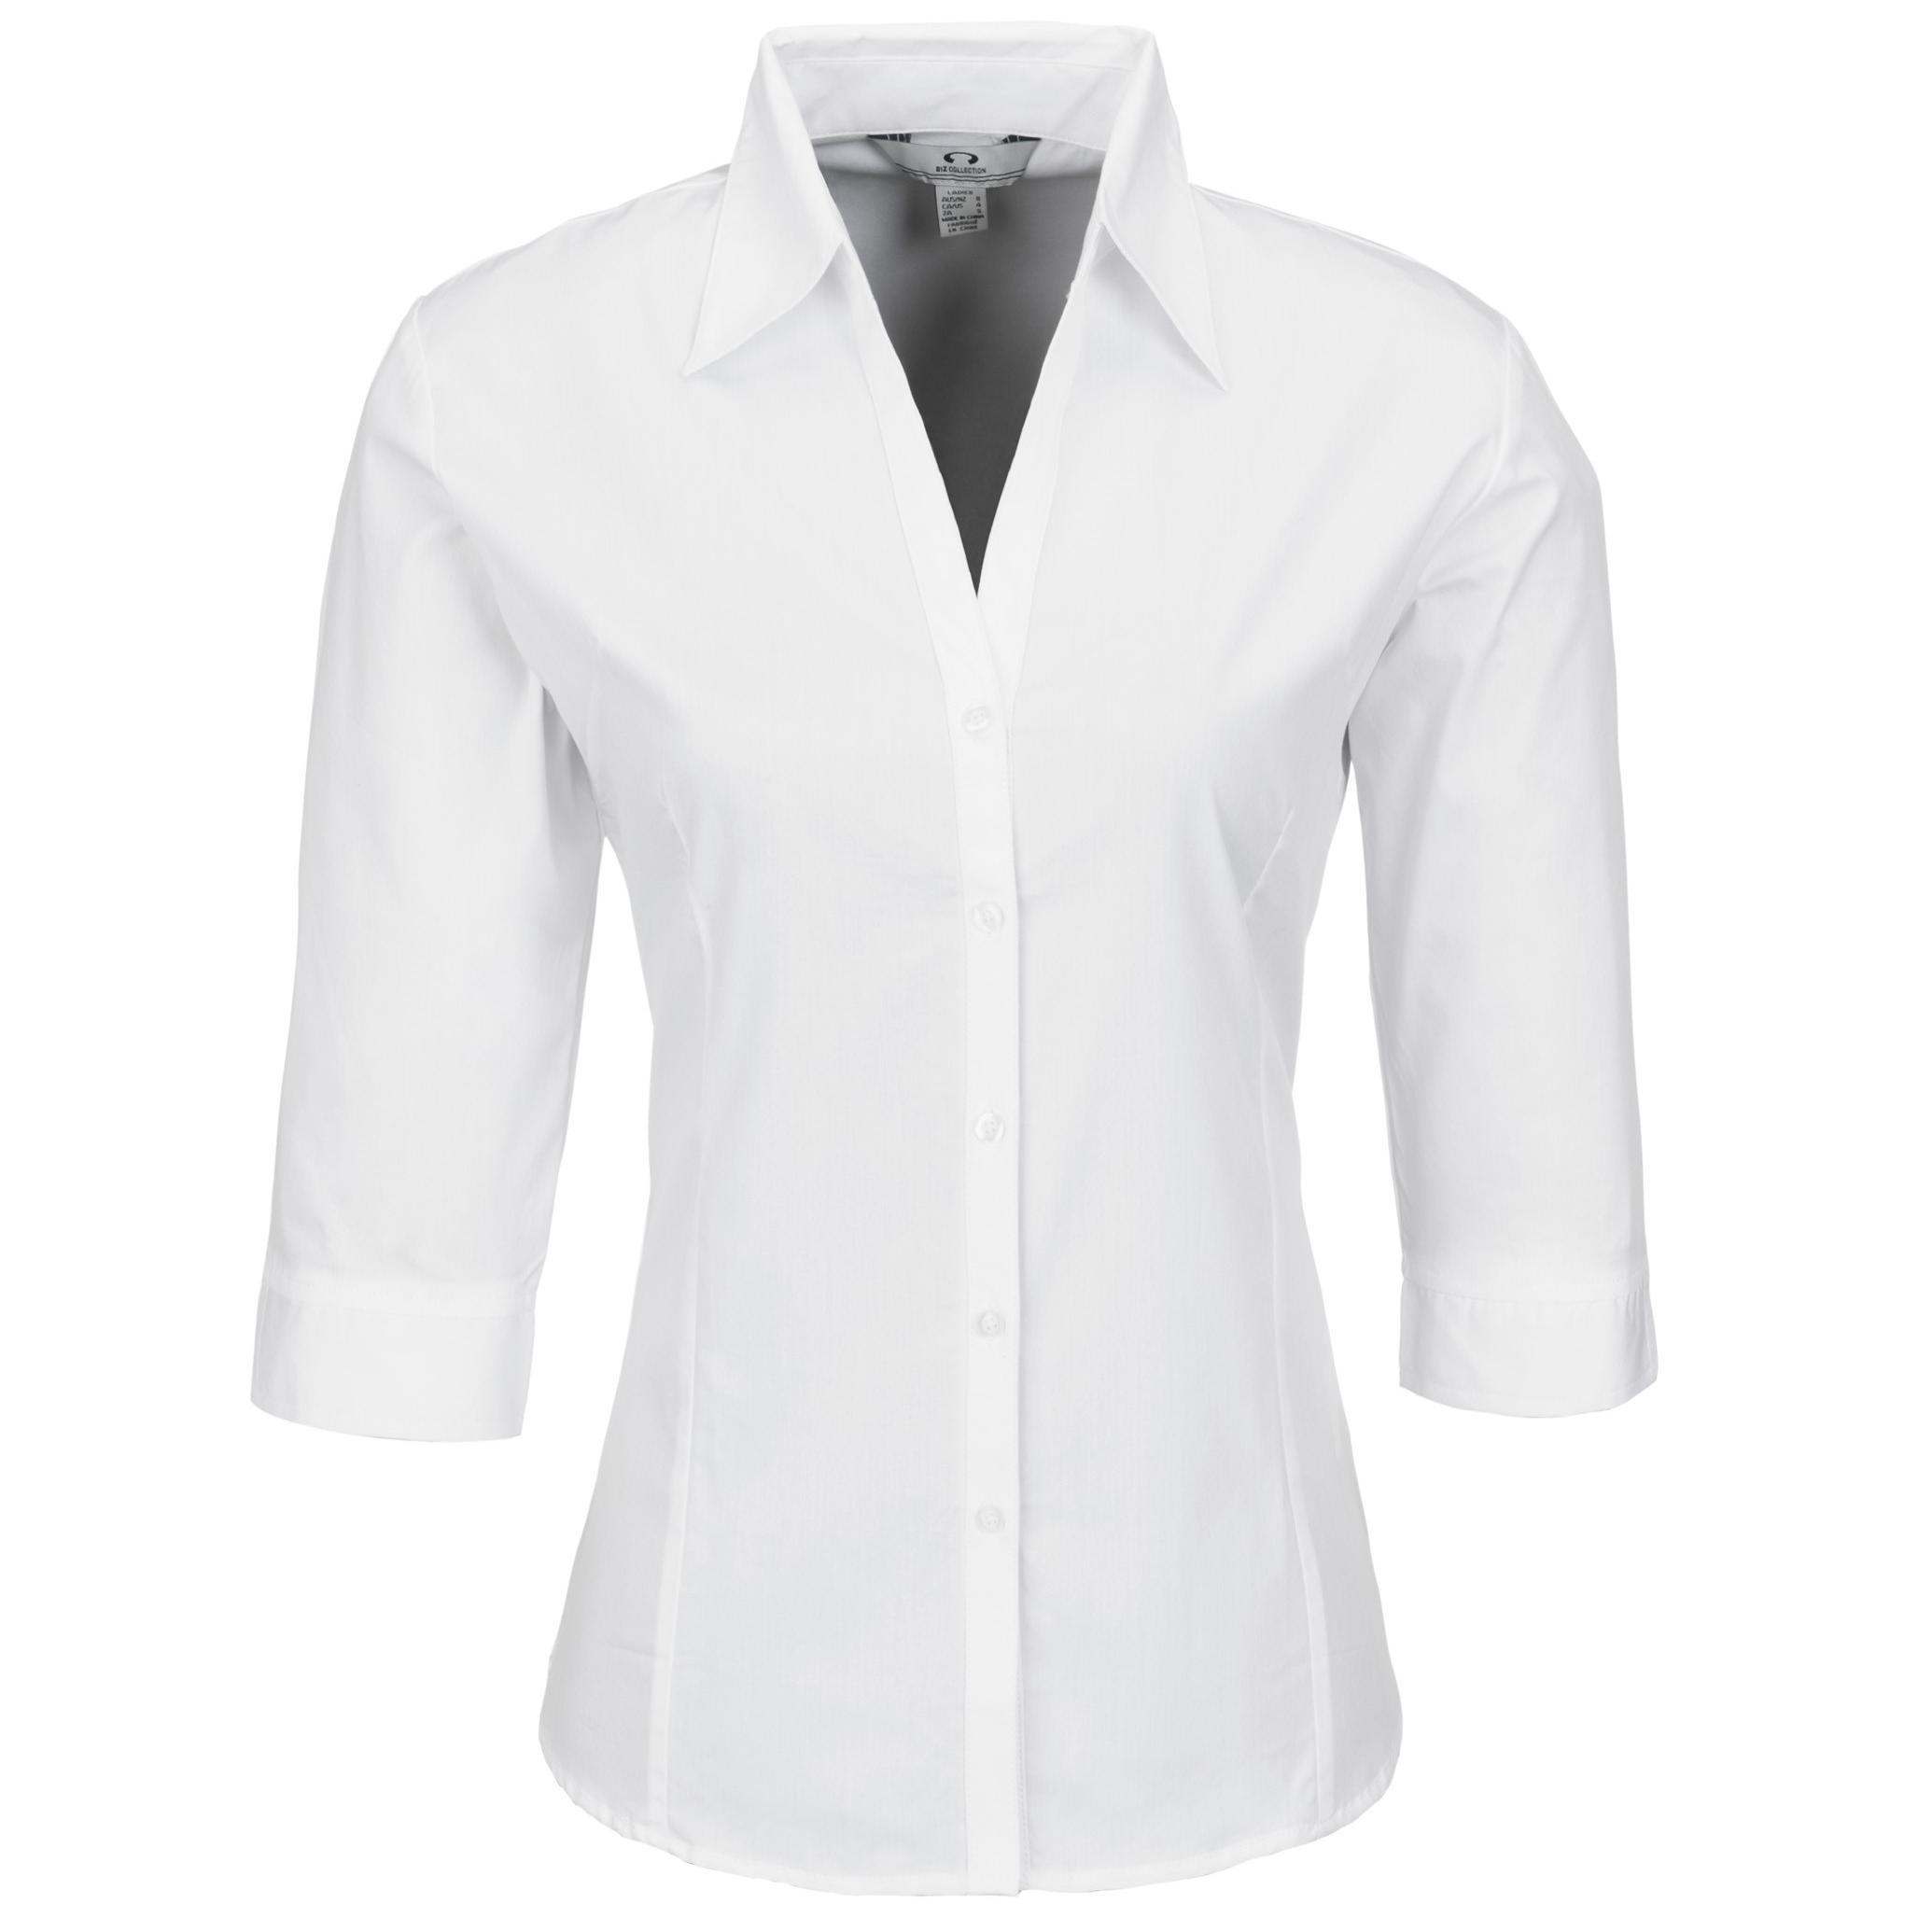 Ladies 3/4 Sleeve Metro Shirt - White Only